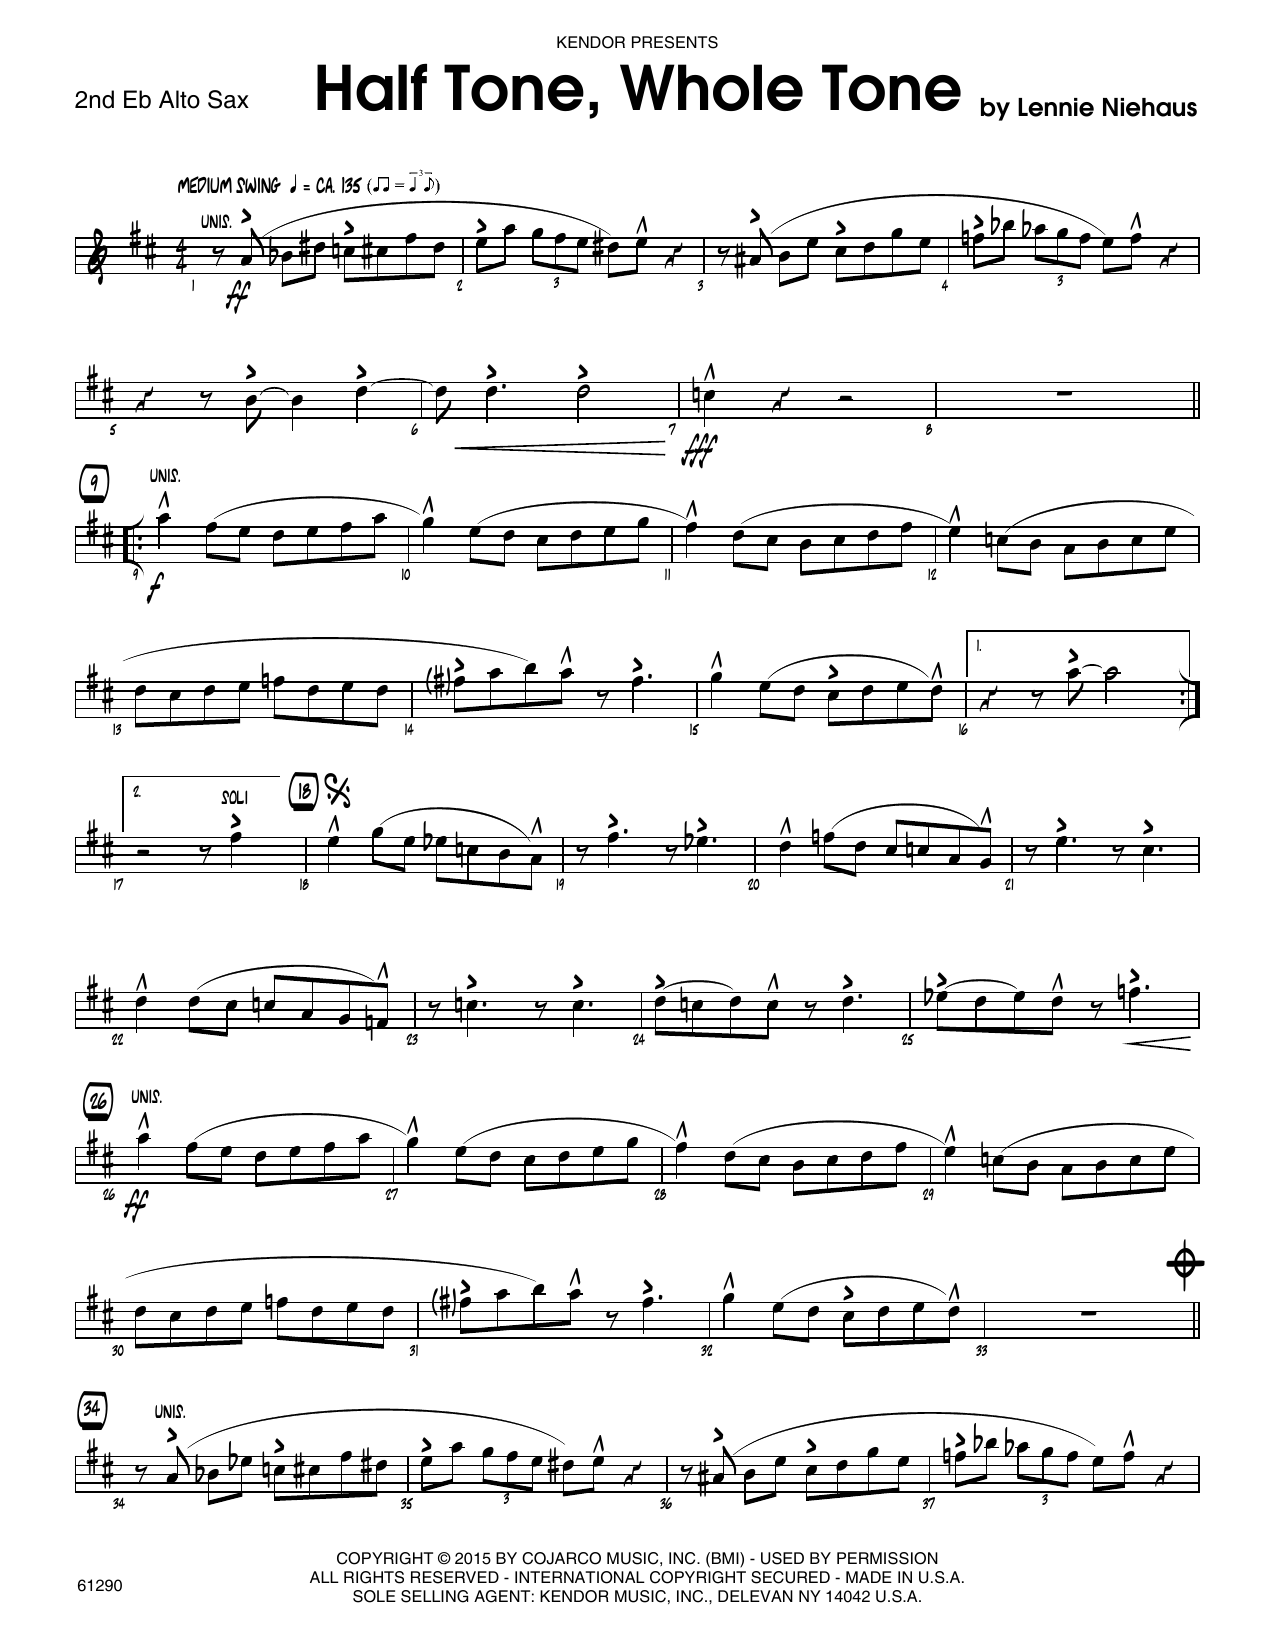 Half Tone, Whole Tone - 2nd Eb Alto Saxophone Sheet Music